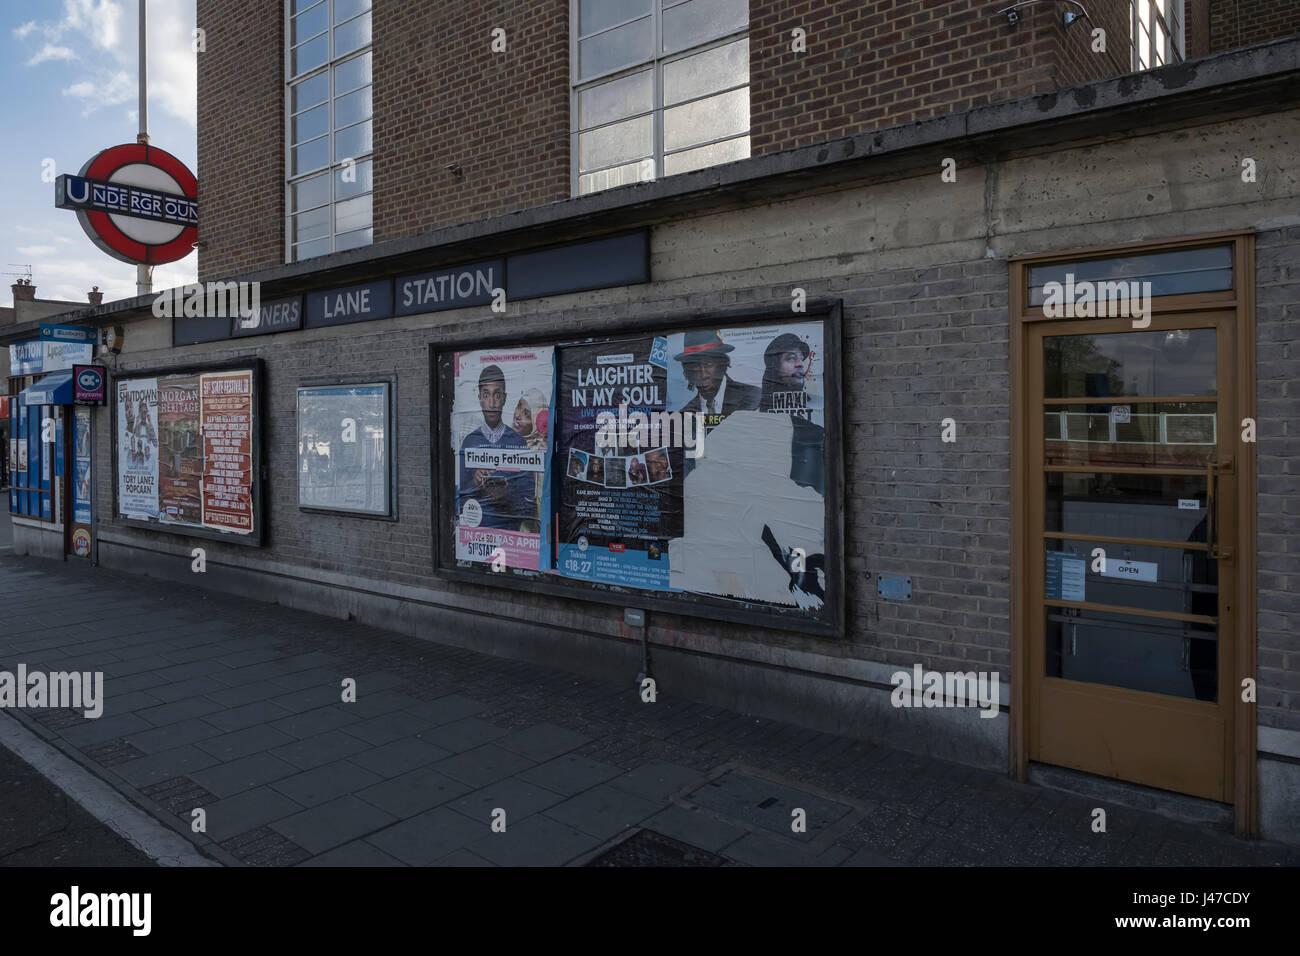 Rayners Lane station - Stock Image